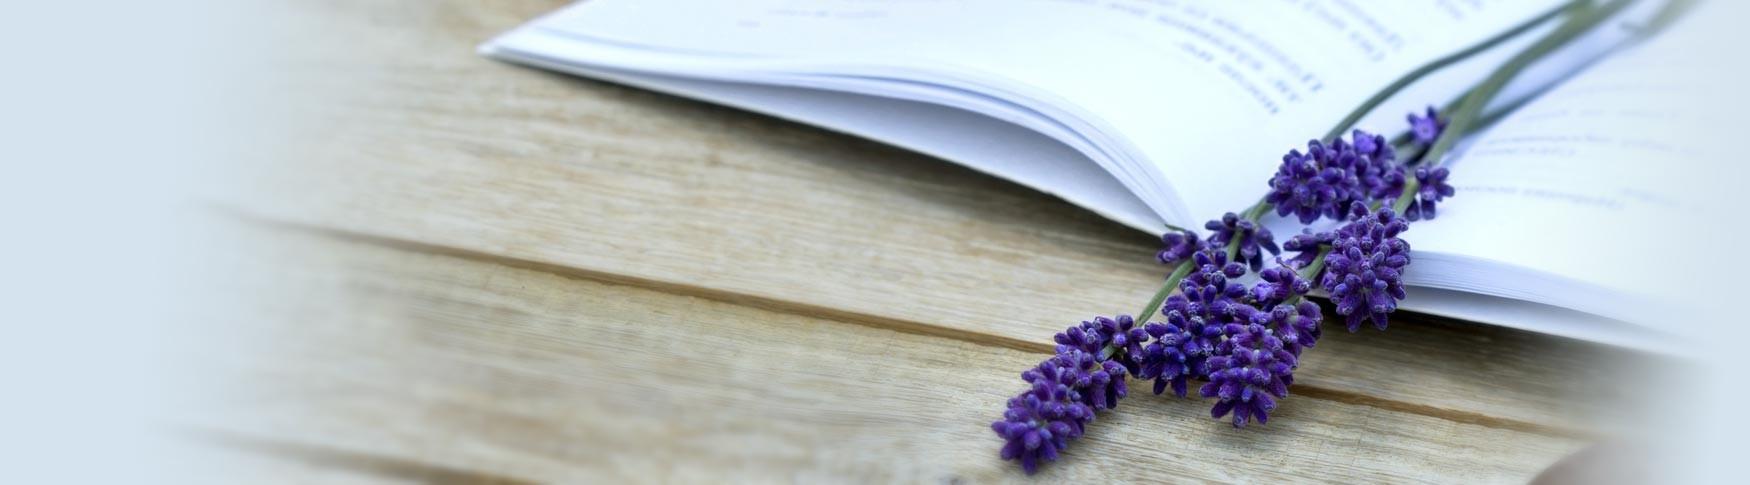 lavender on book